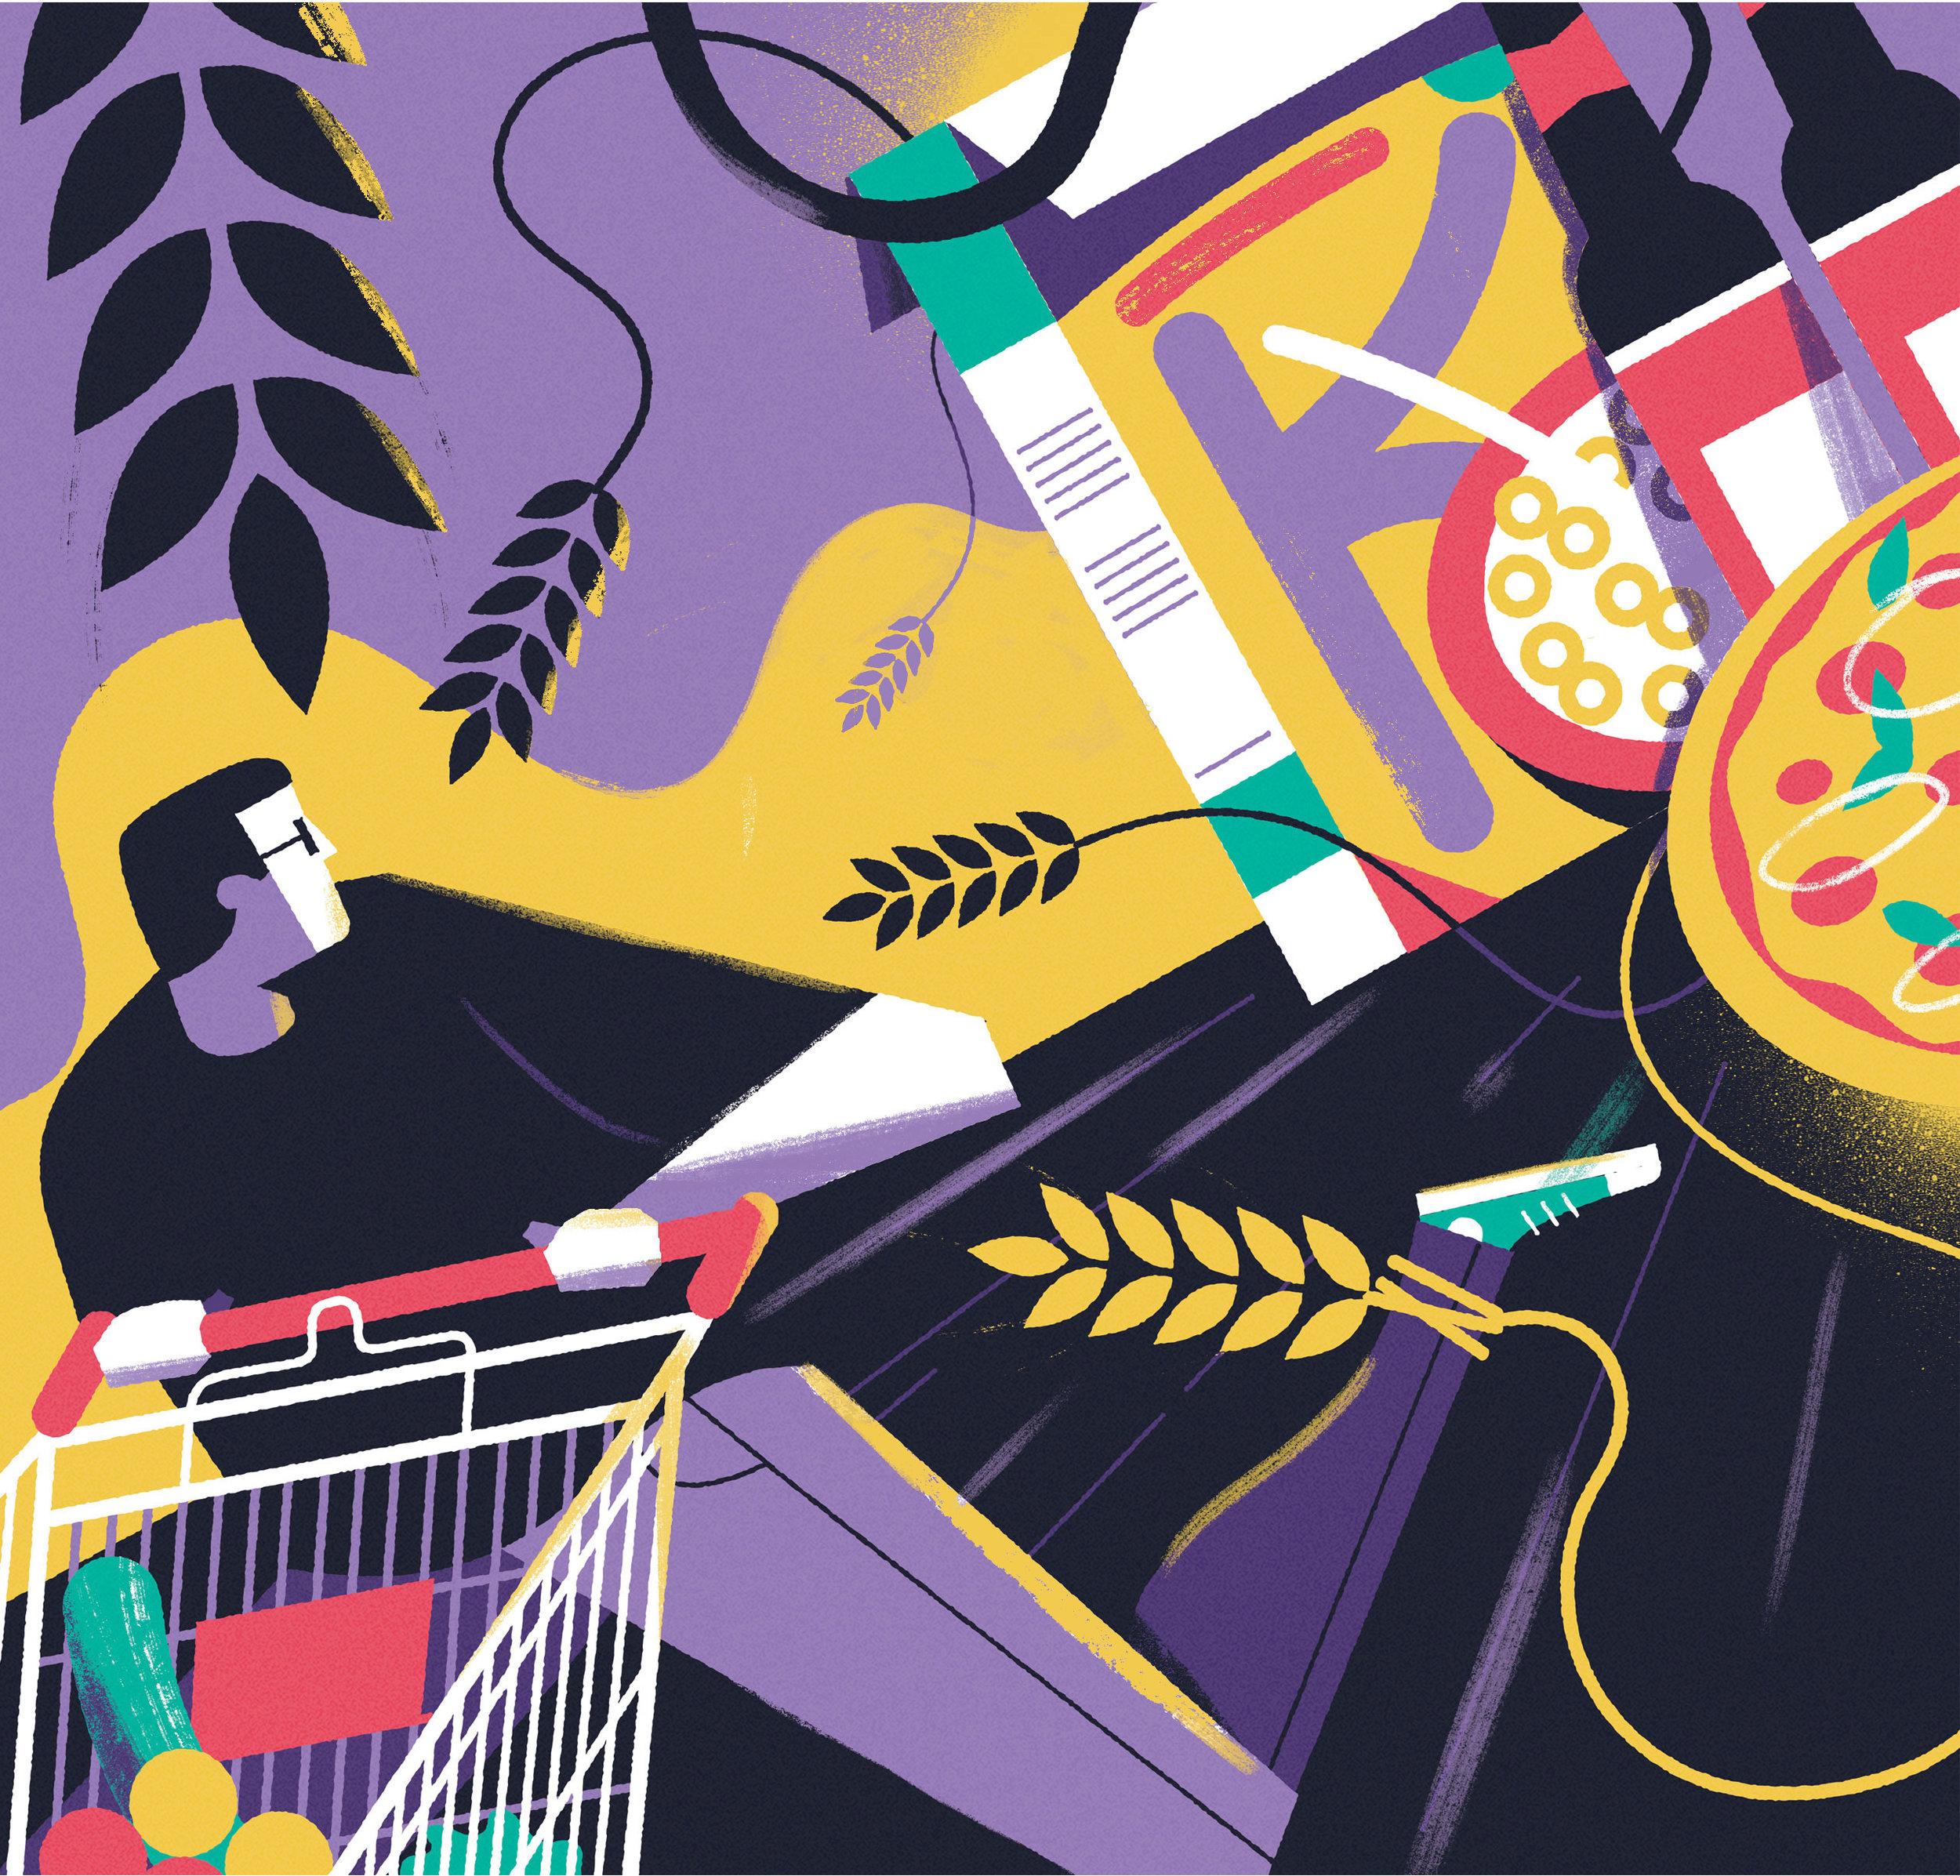 dale edwin murray freelance illustrator forever sports magazine illustration